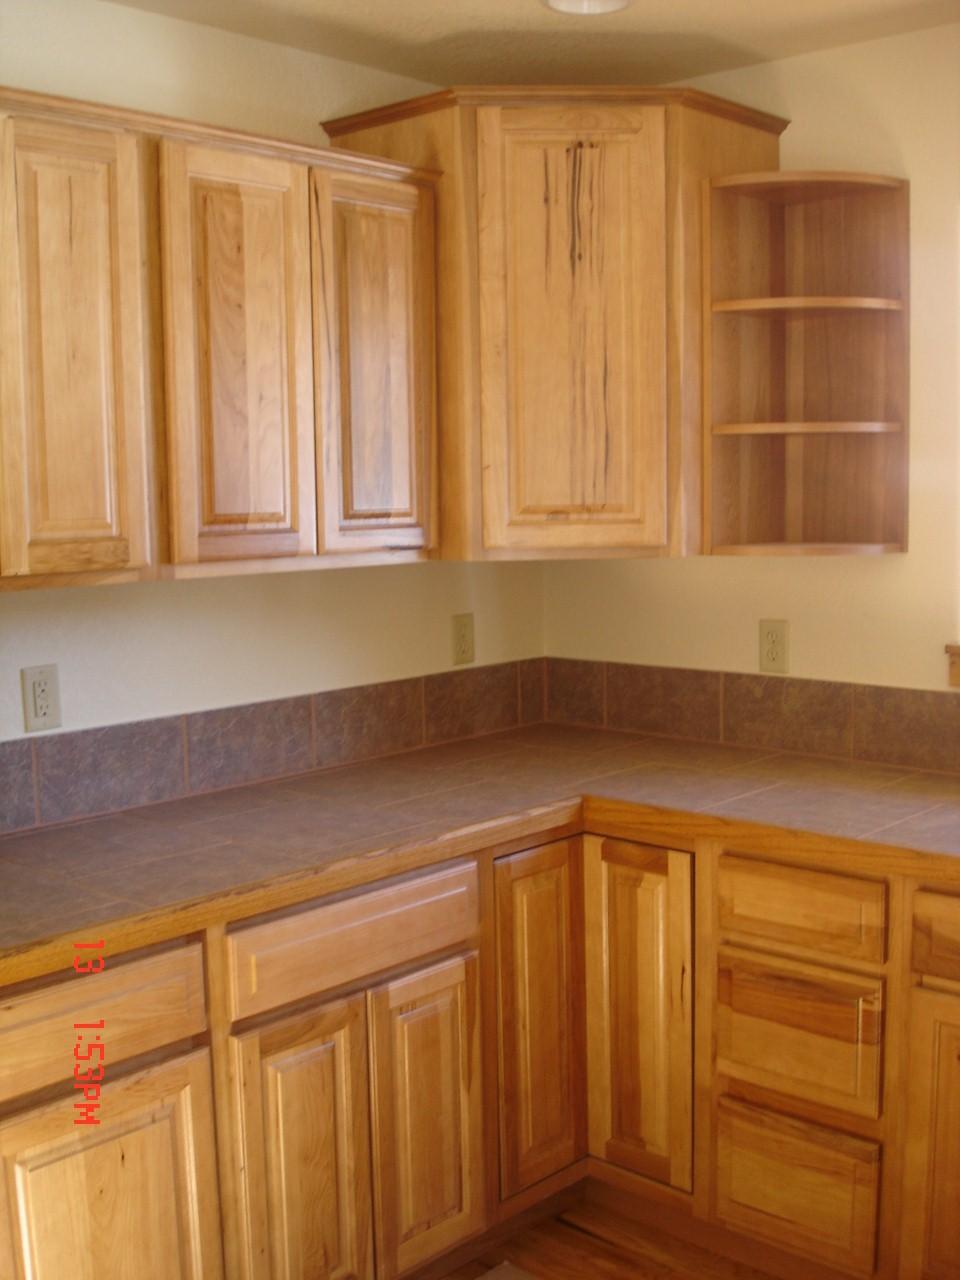 photo photoid cabinets kitchen Kitchen cabinets